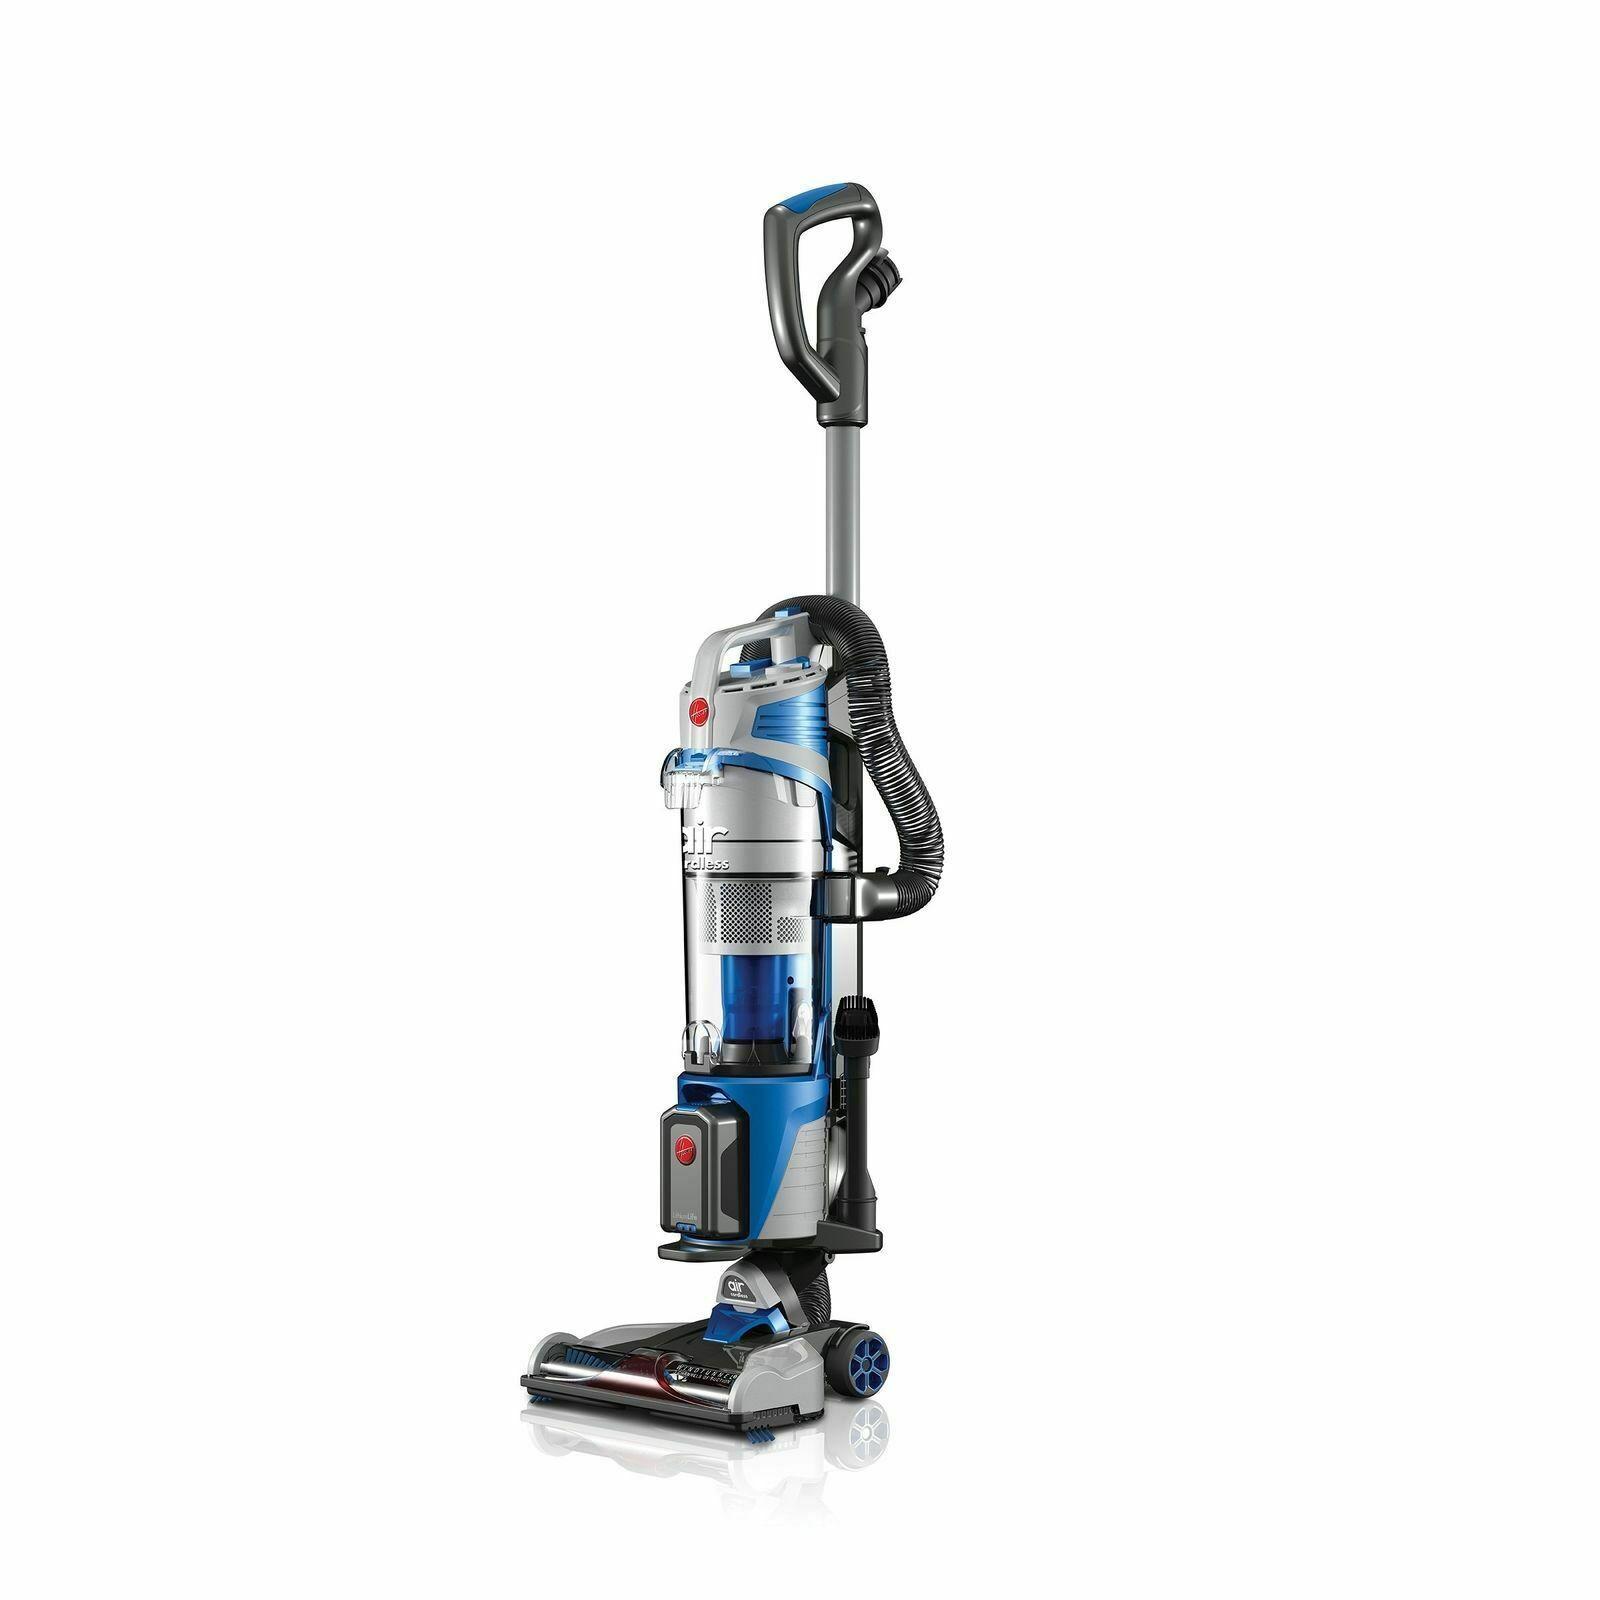 HOOVER Vacuum Cleaner Air Lift 20 Volt Lithium Ion Cordless